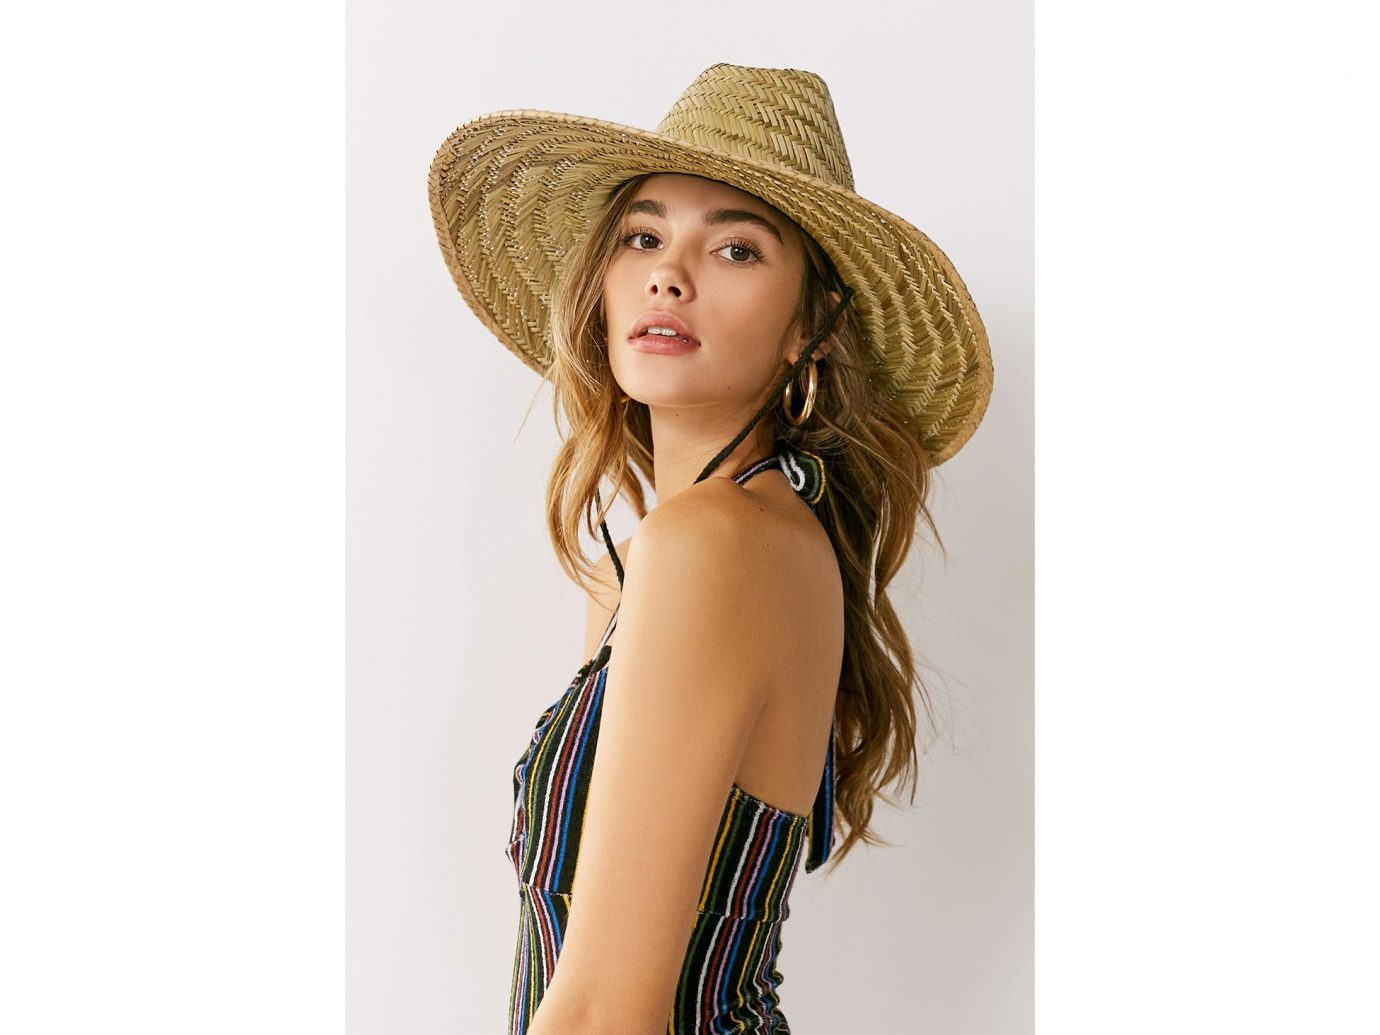 Goldcoast King Rush Straw Lifeguard Hat